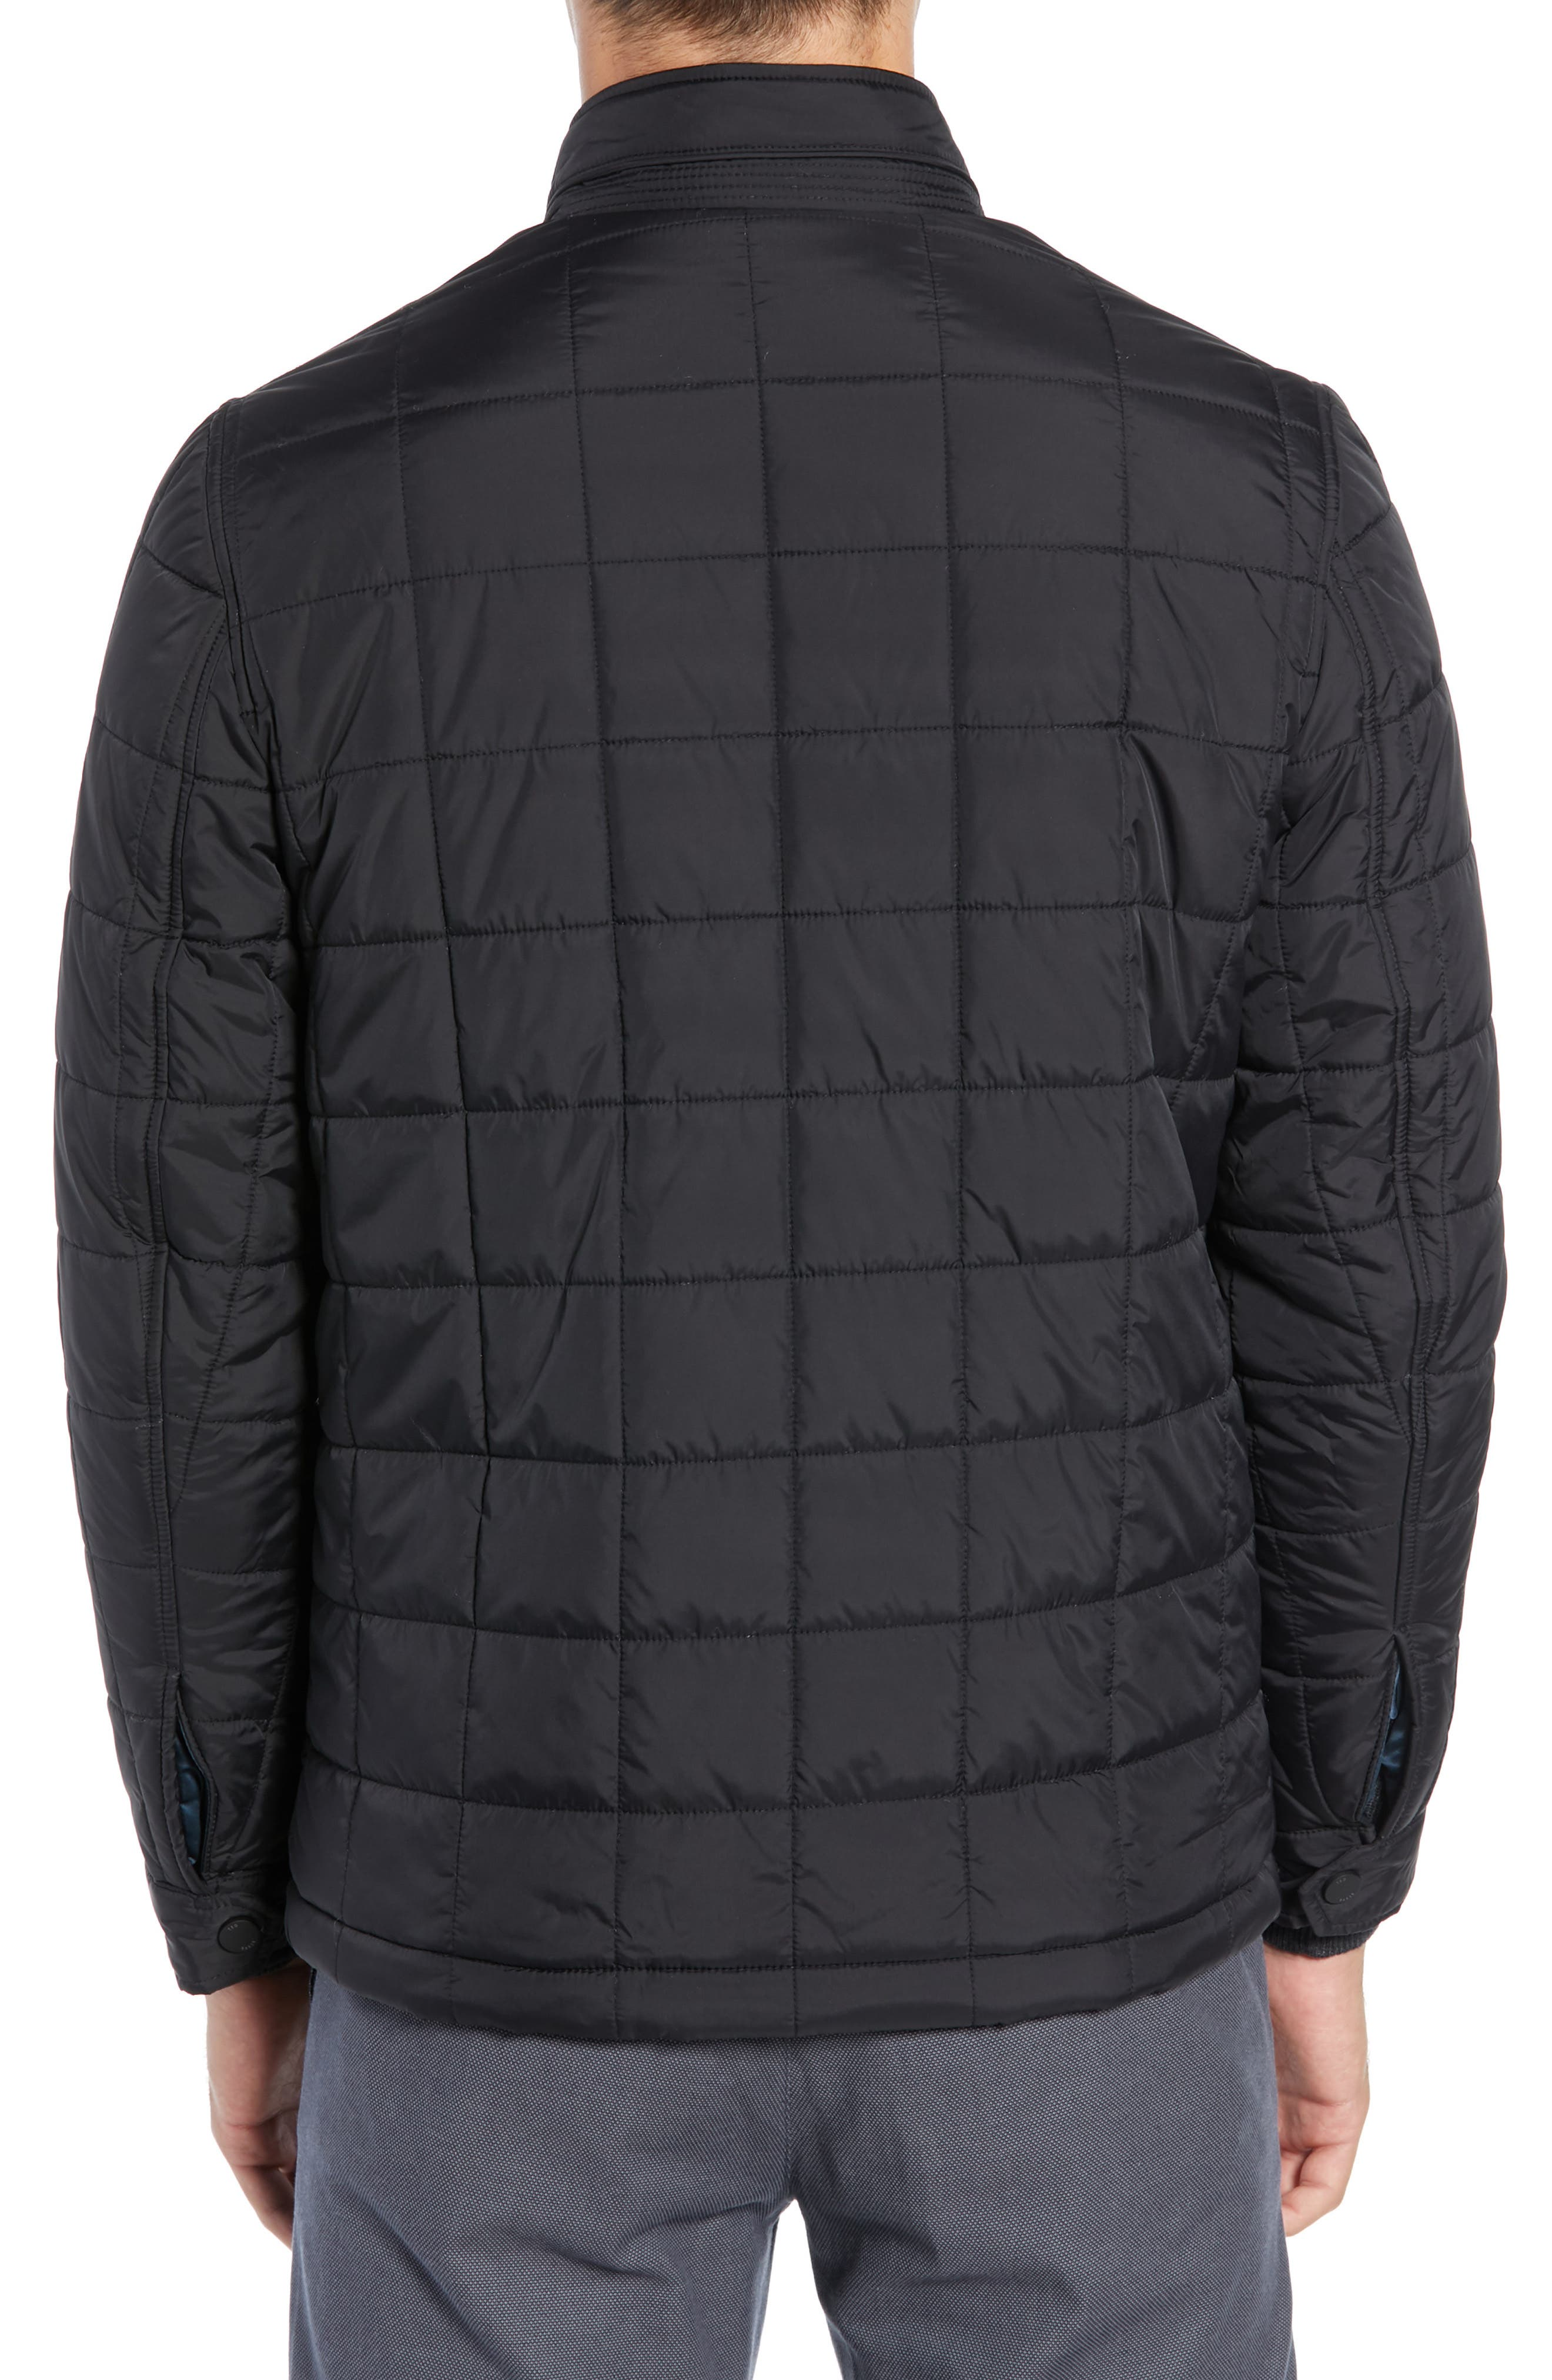 Lesta Quilted Slim Fit Jacket,                             Alternate thumbnail 2, color,                             BLACK